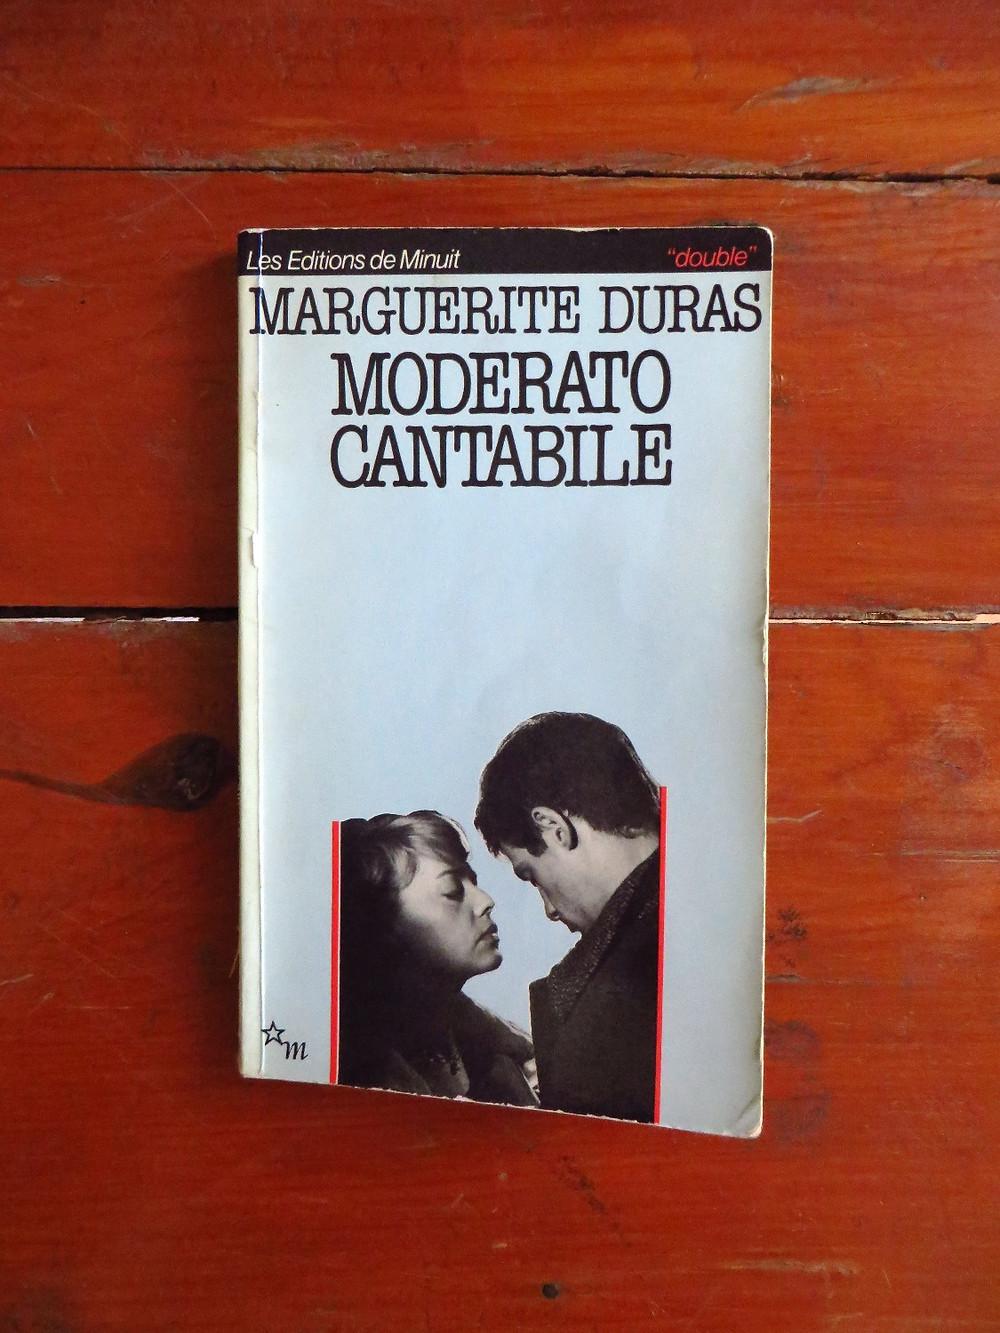 Photo : Moderato Cantabile, Marguerite Duras